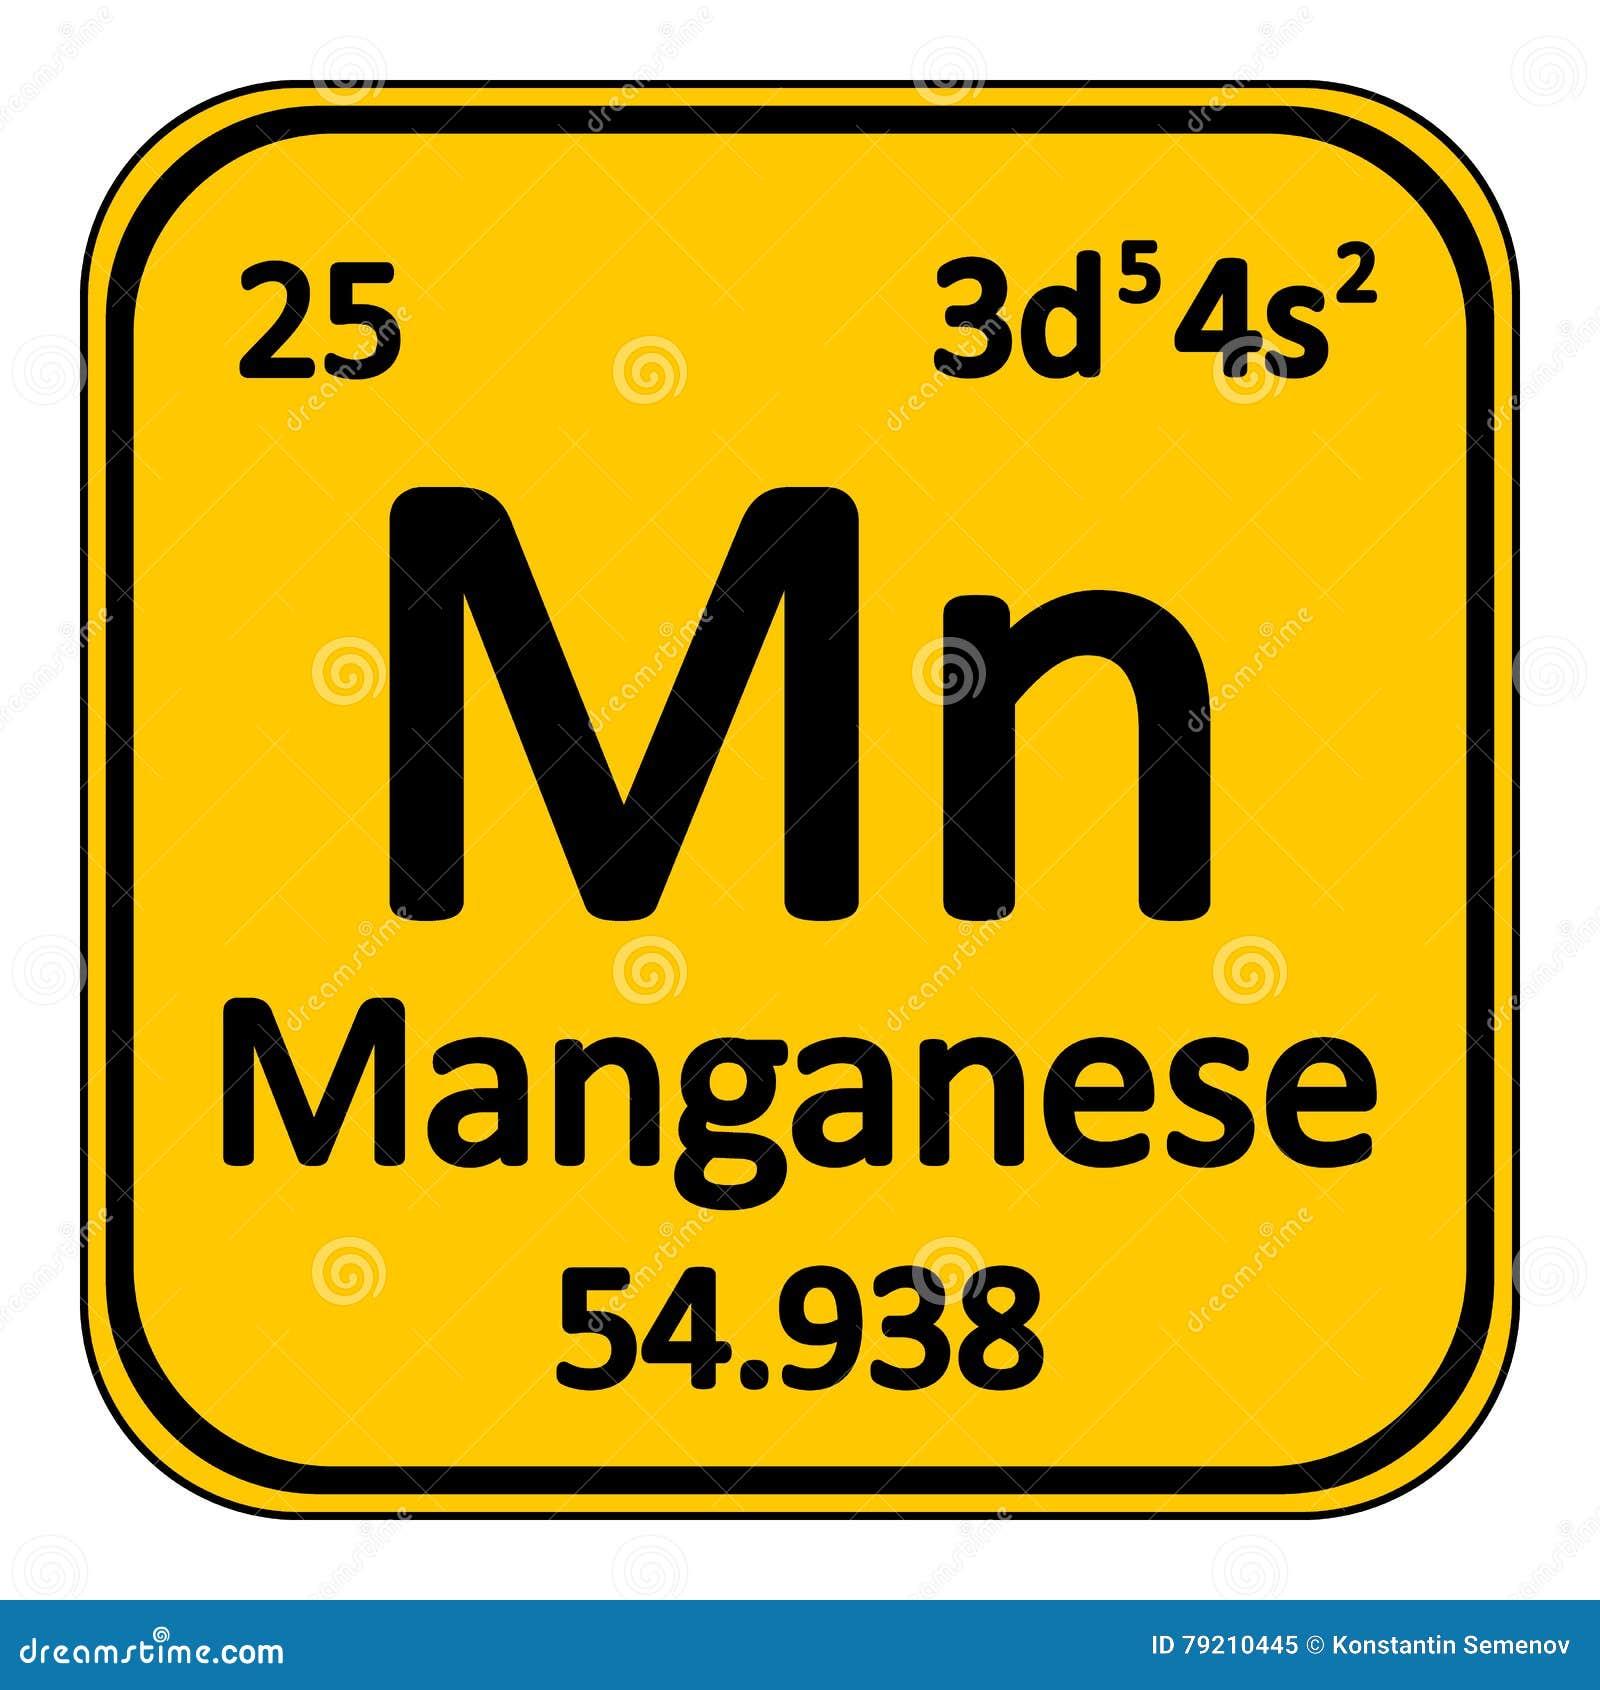 Periodic table element manganese icon stock illustration image periodic table element manganese icon gamestrikefo Images